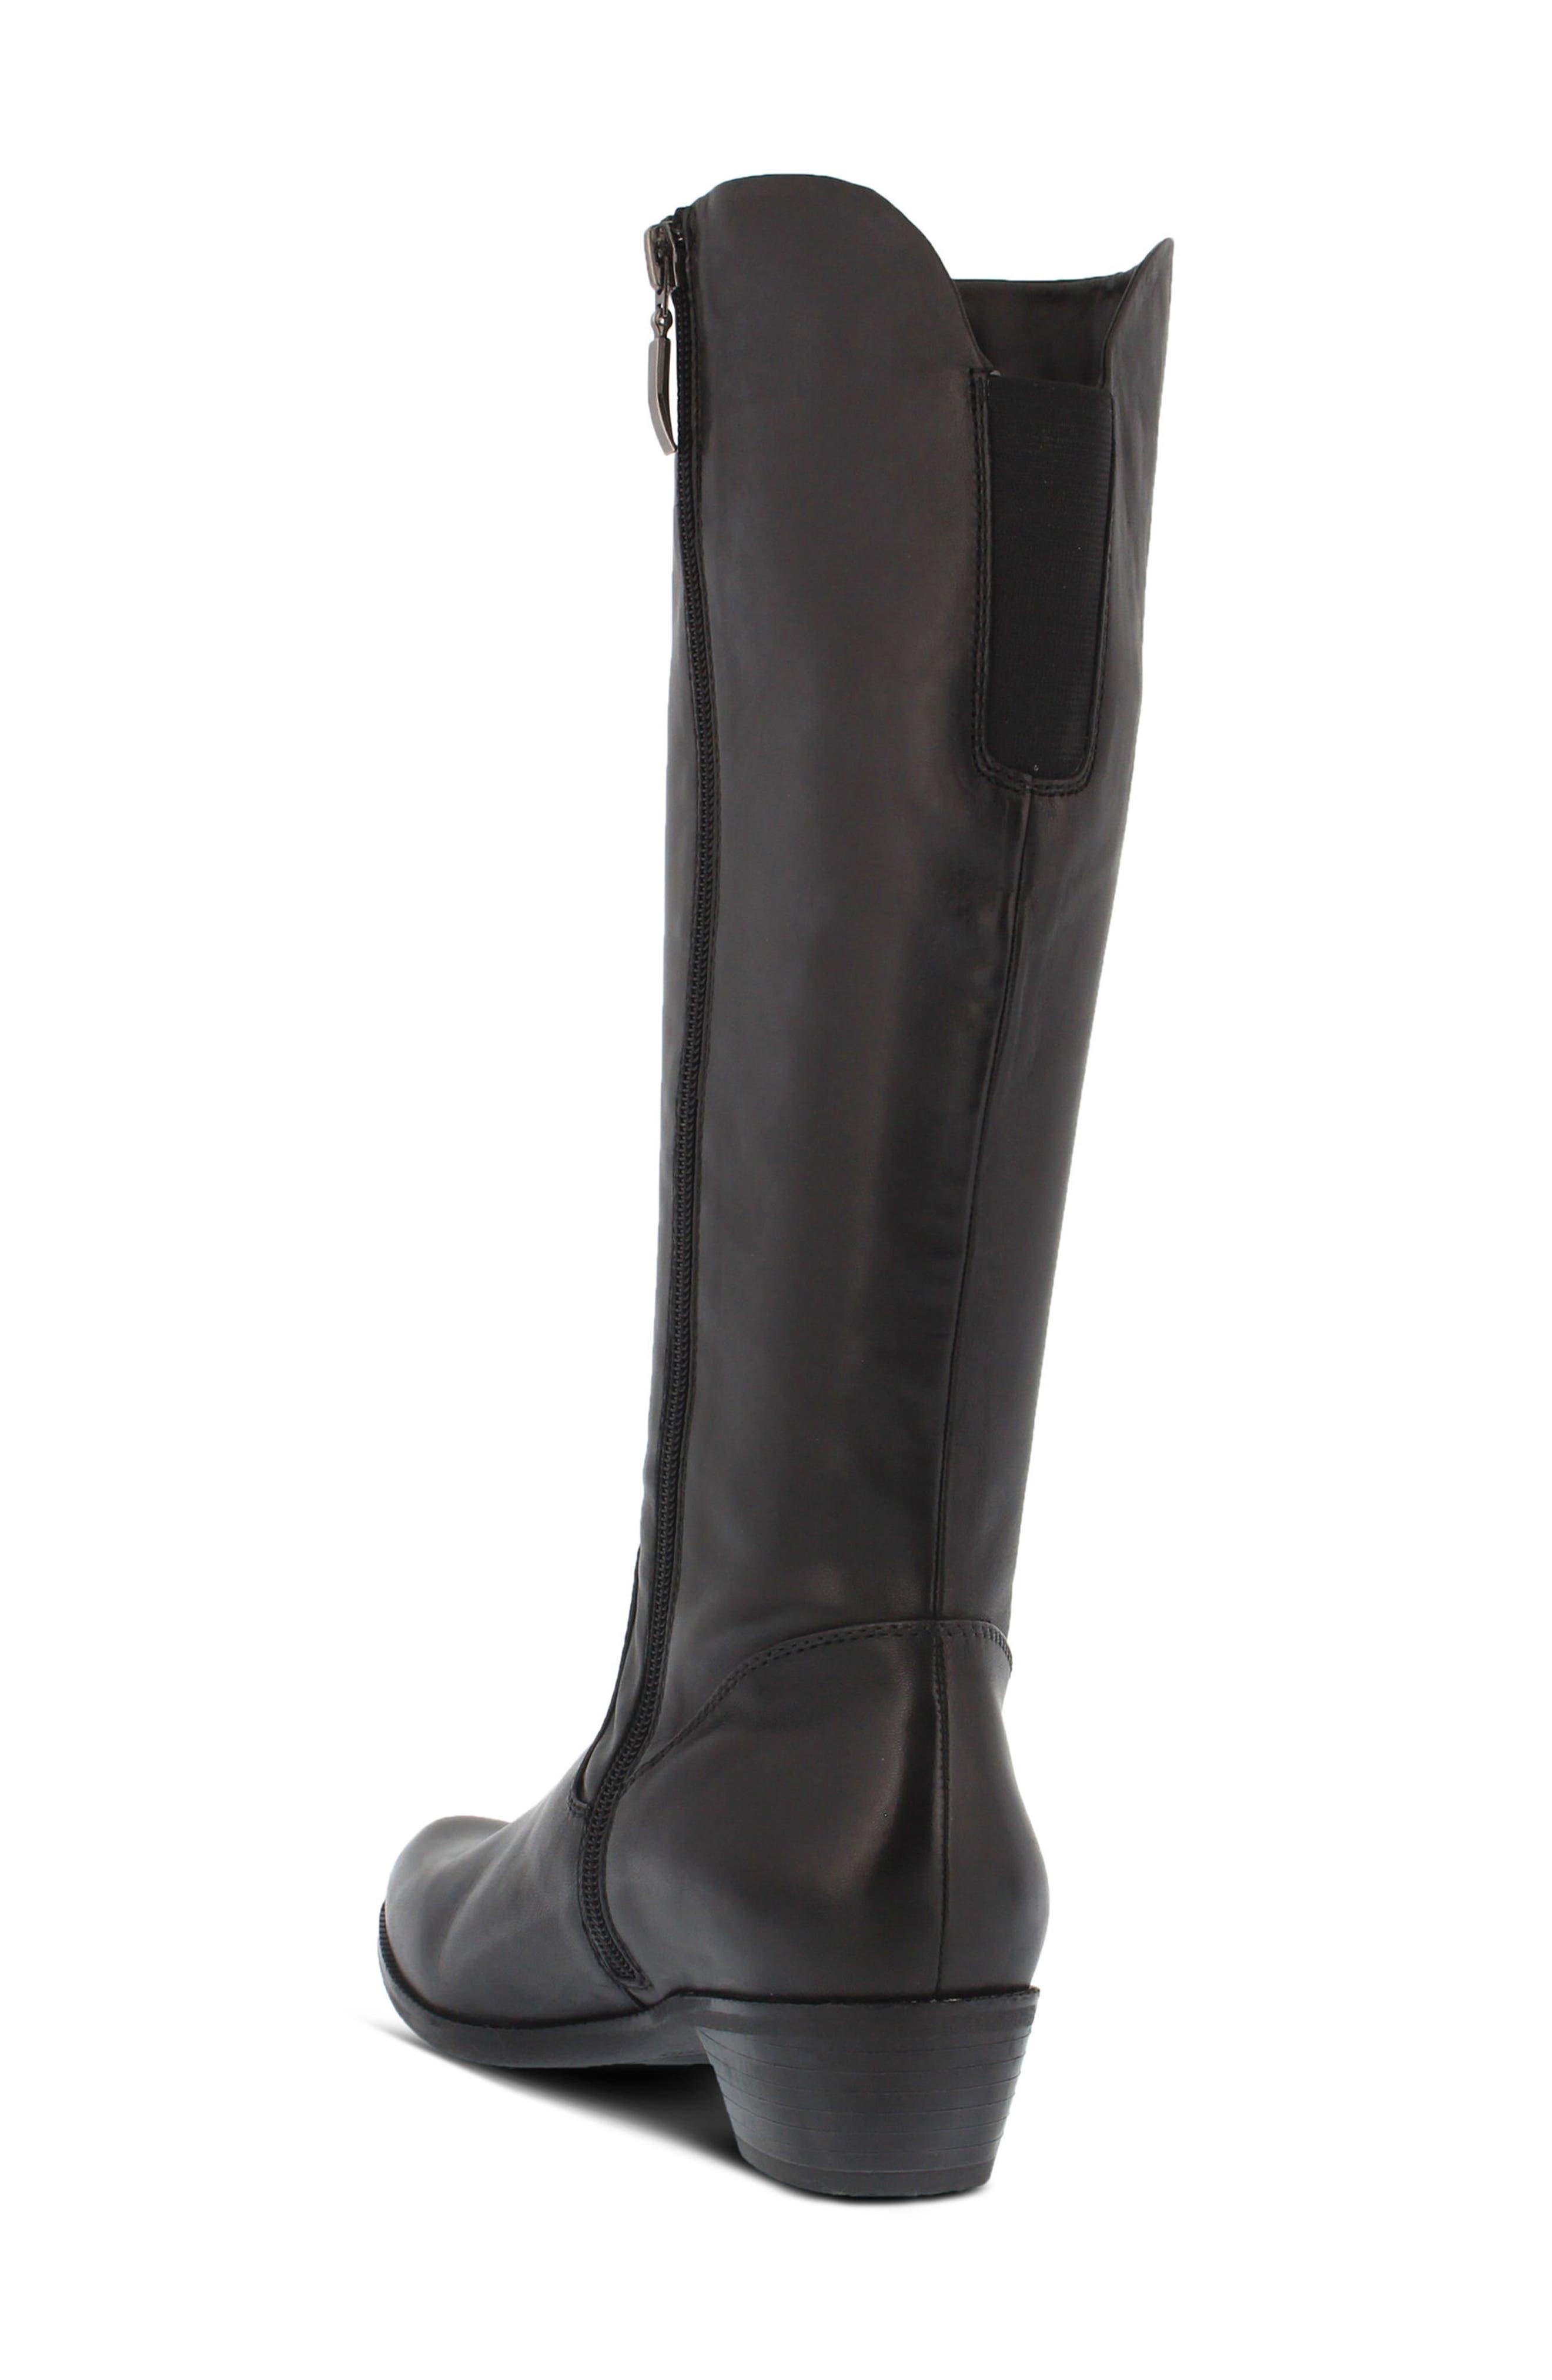 Bolah Tall Boot,                             Alternate thumbnail 2, color,                             Black Leather